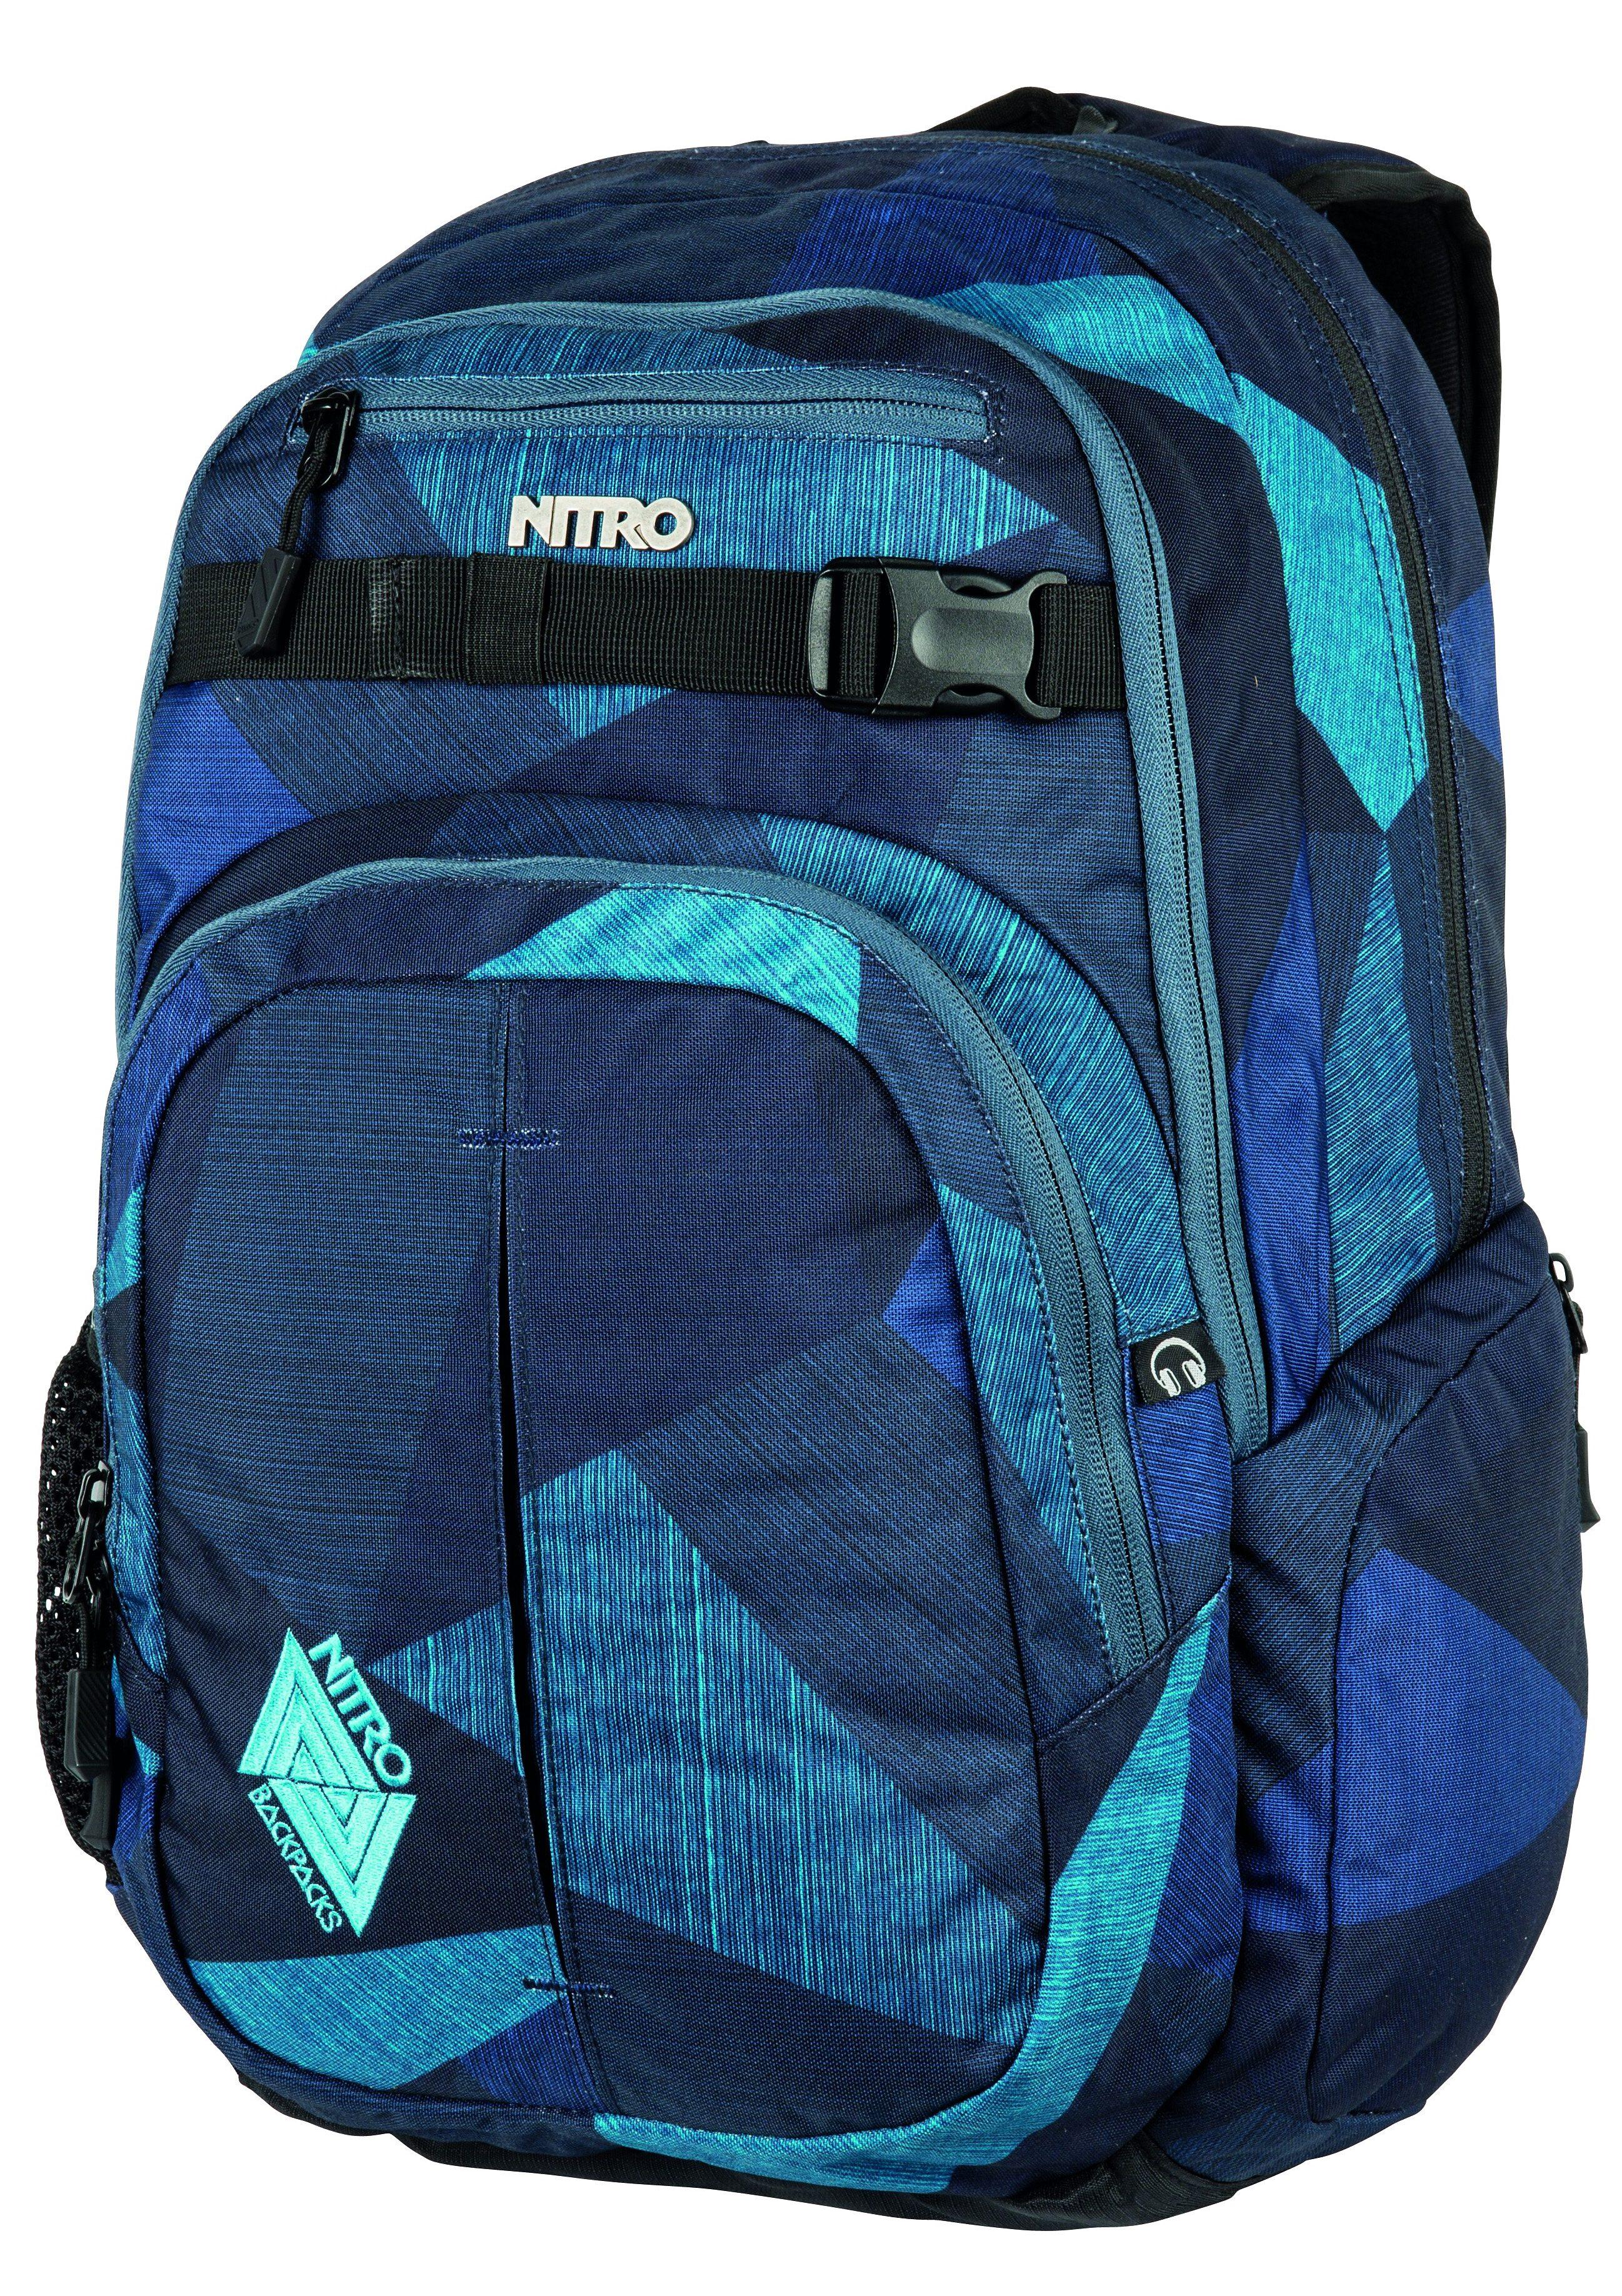 Nitro Schulrucksack, »Chase - Fragments Blue«